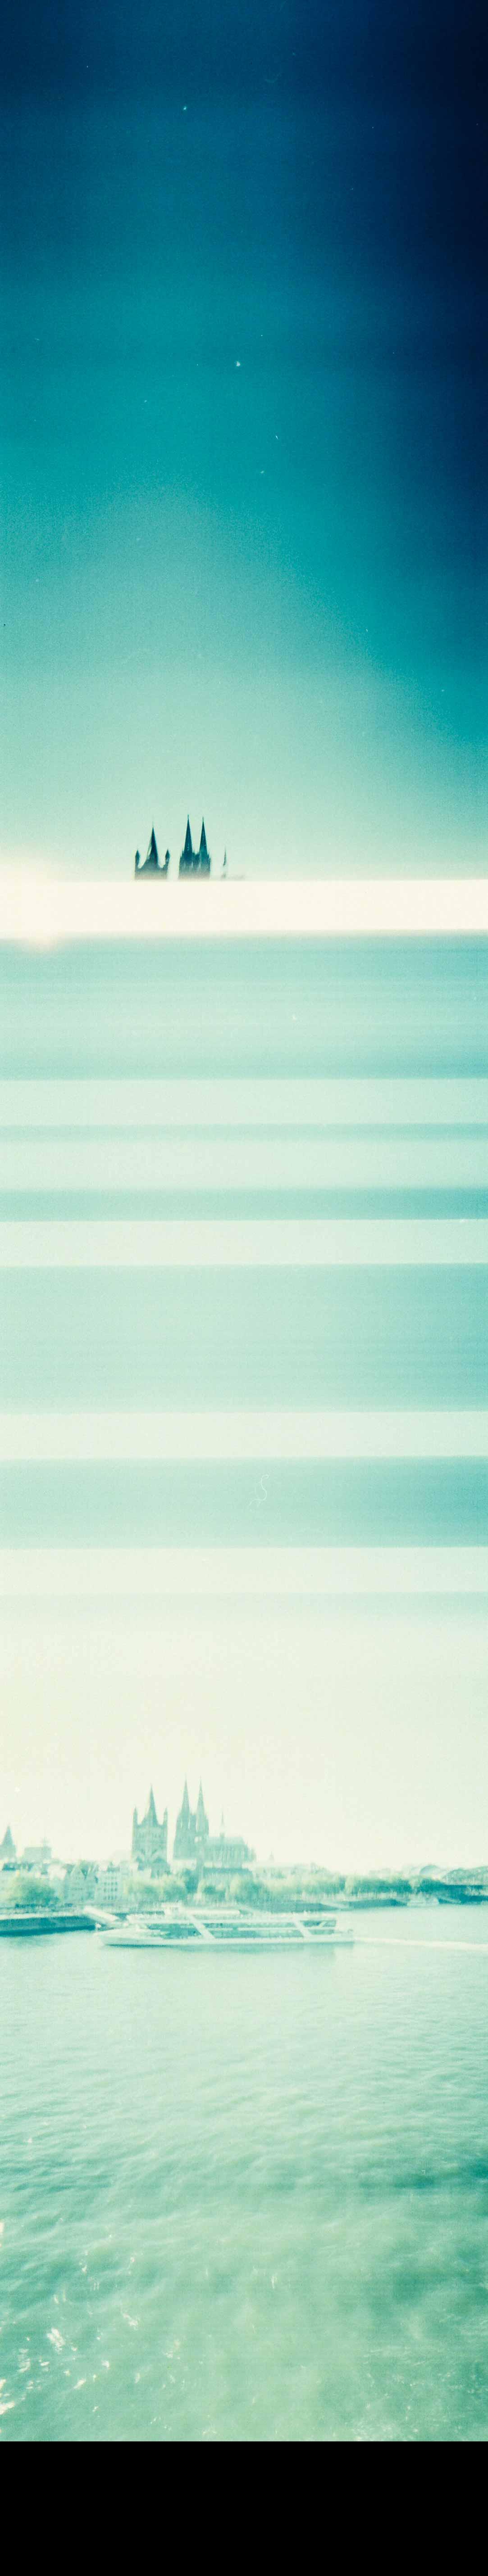 panorama_wearecity_koeln.png